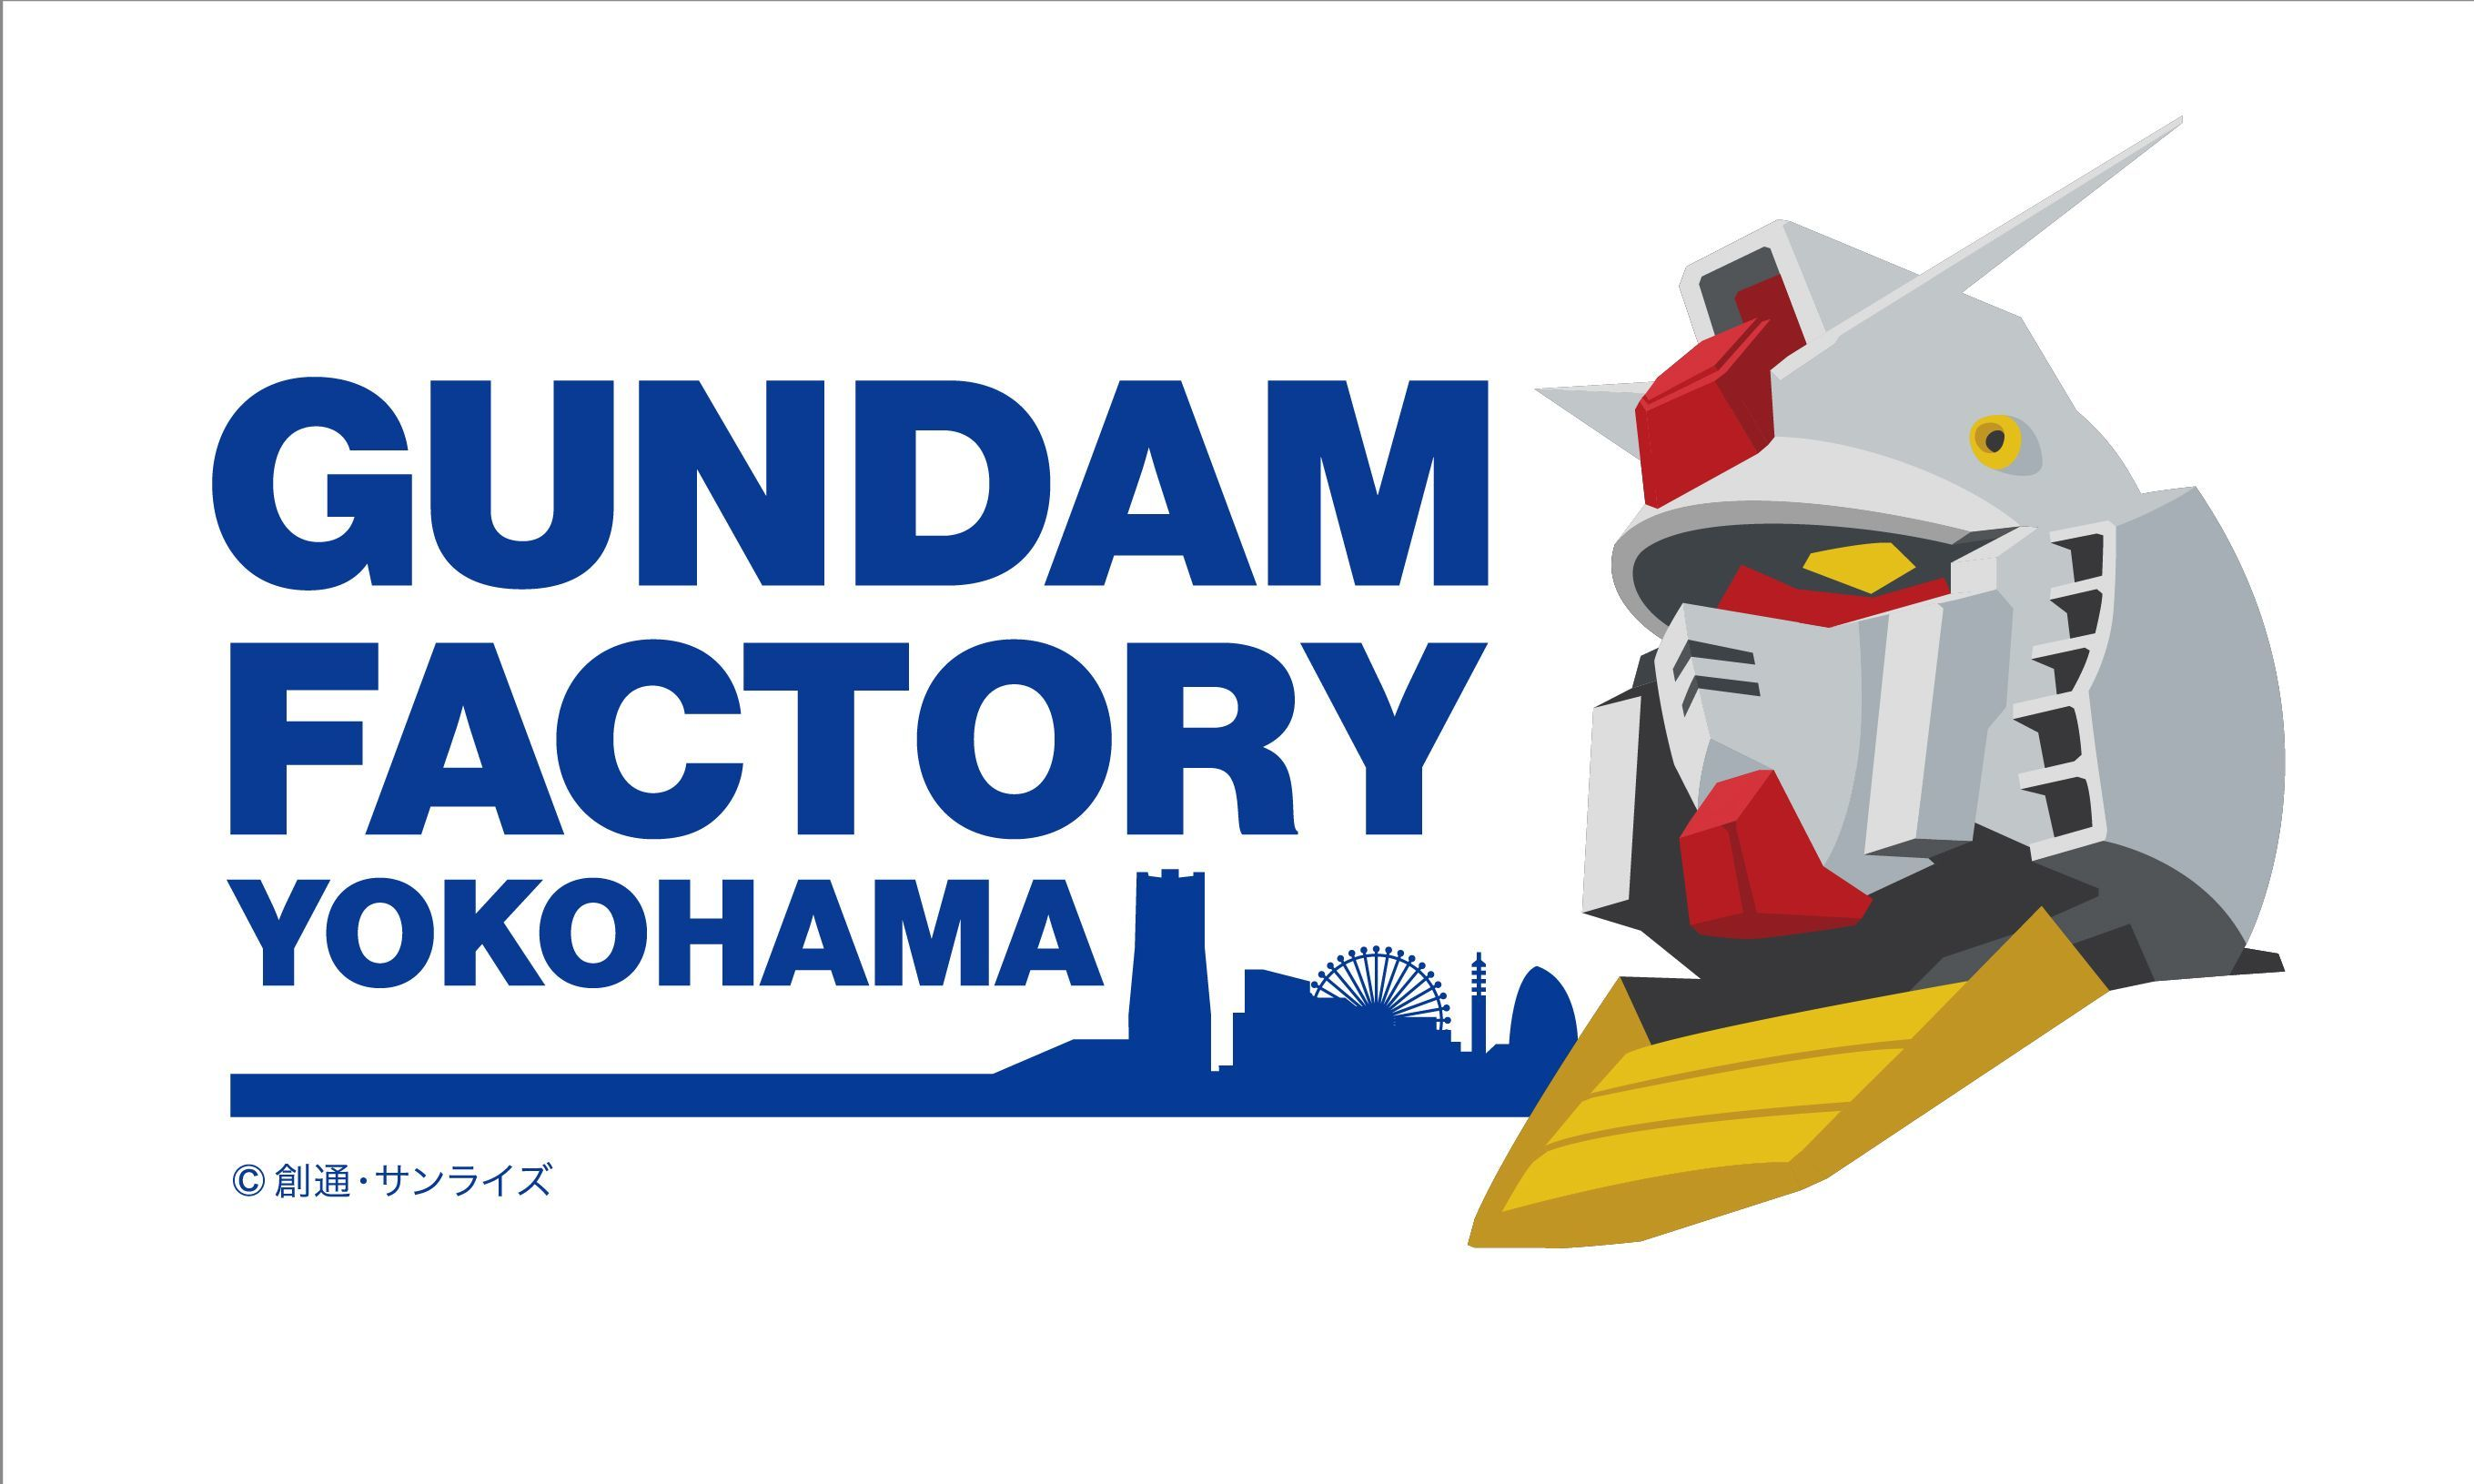 「GUNDAM FACTORY YOKOHAMA」ロゴ (C)創通・サンライズ